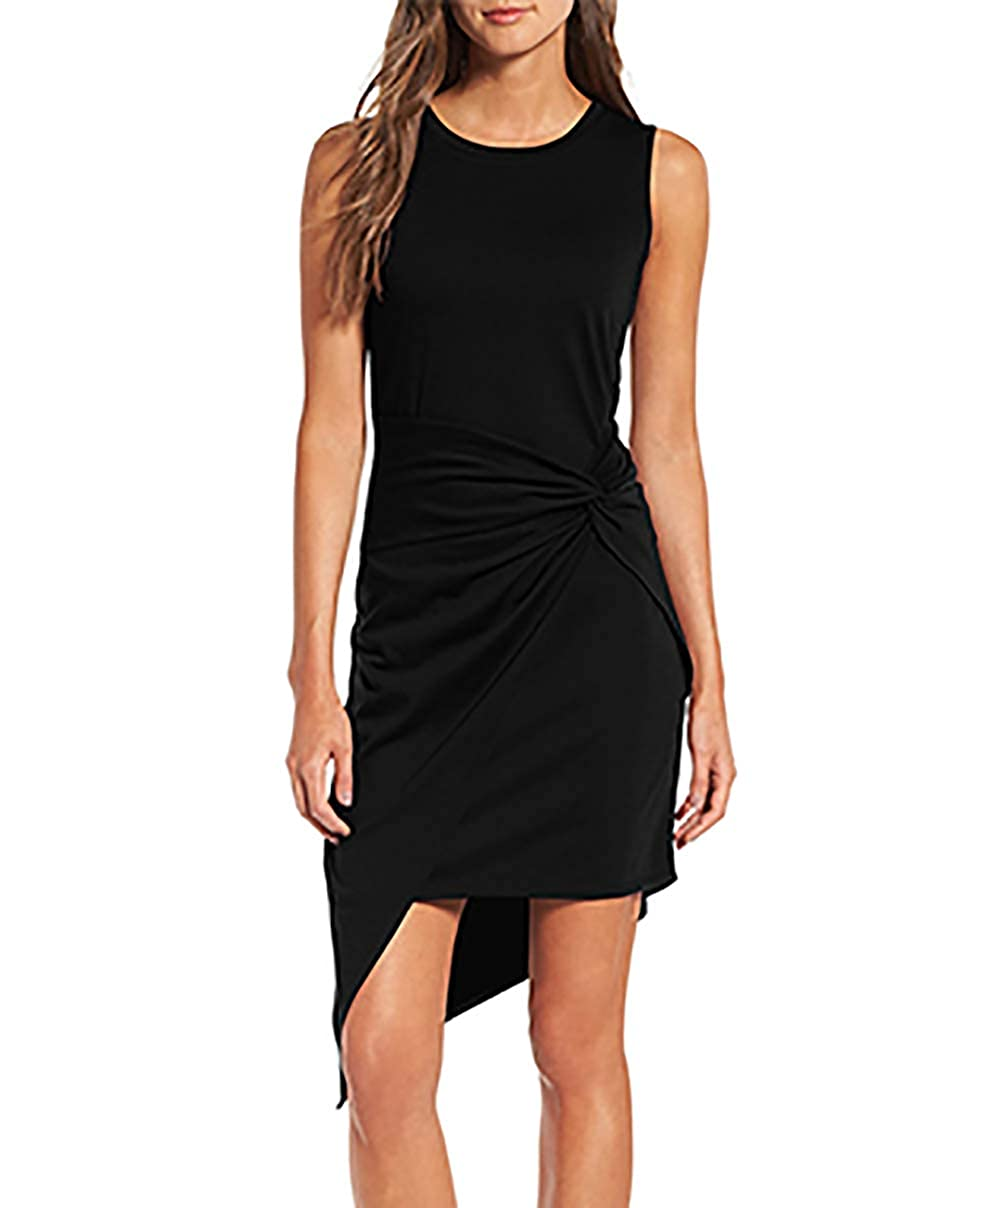 Black VamJump Women's Sleeveless Knot Asymmetrical Bodycon Work Sheath Dress